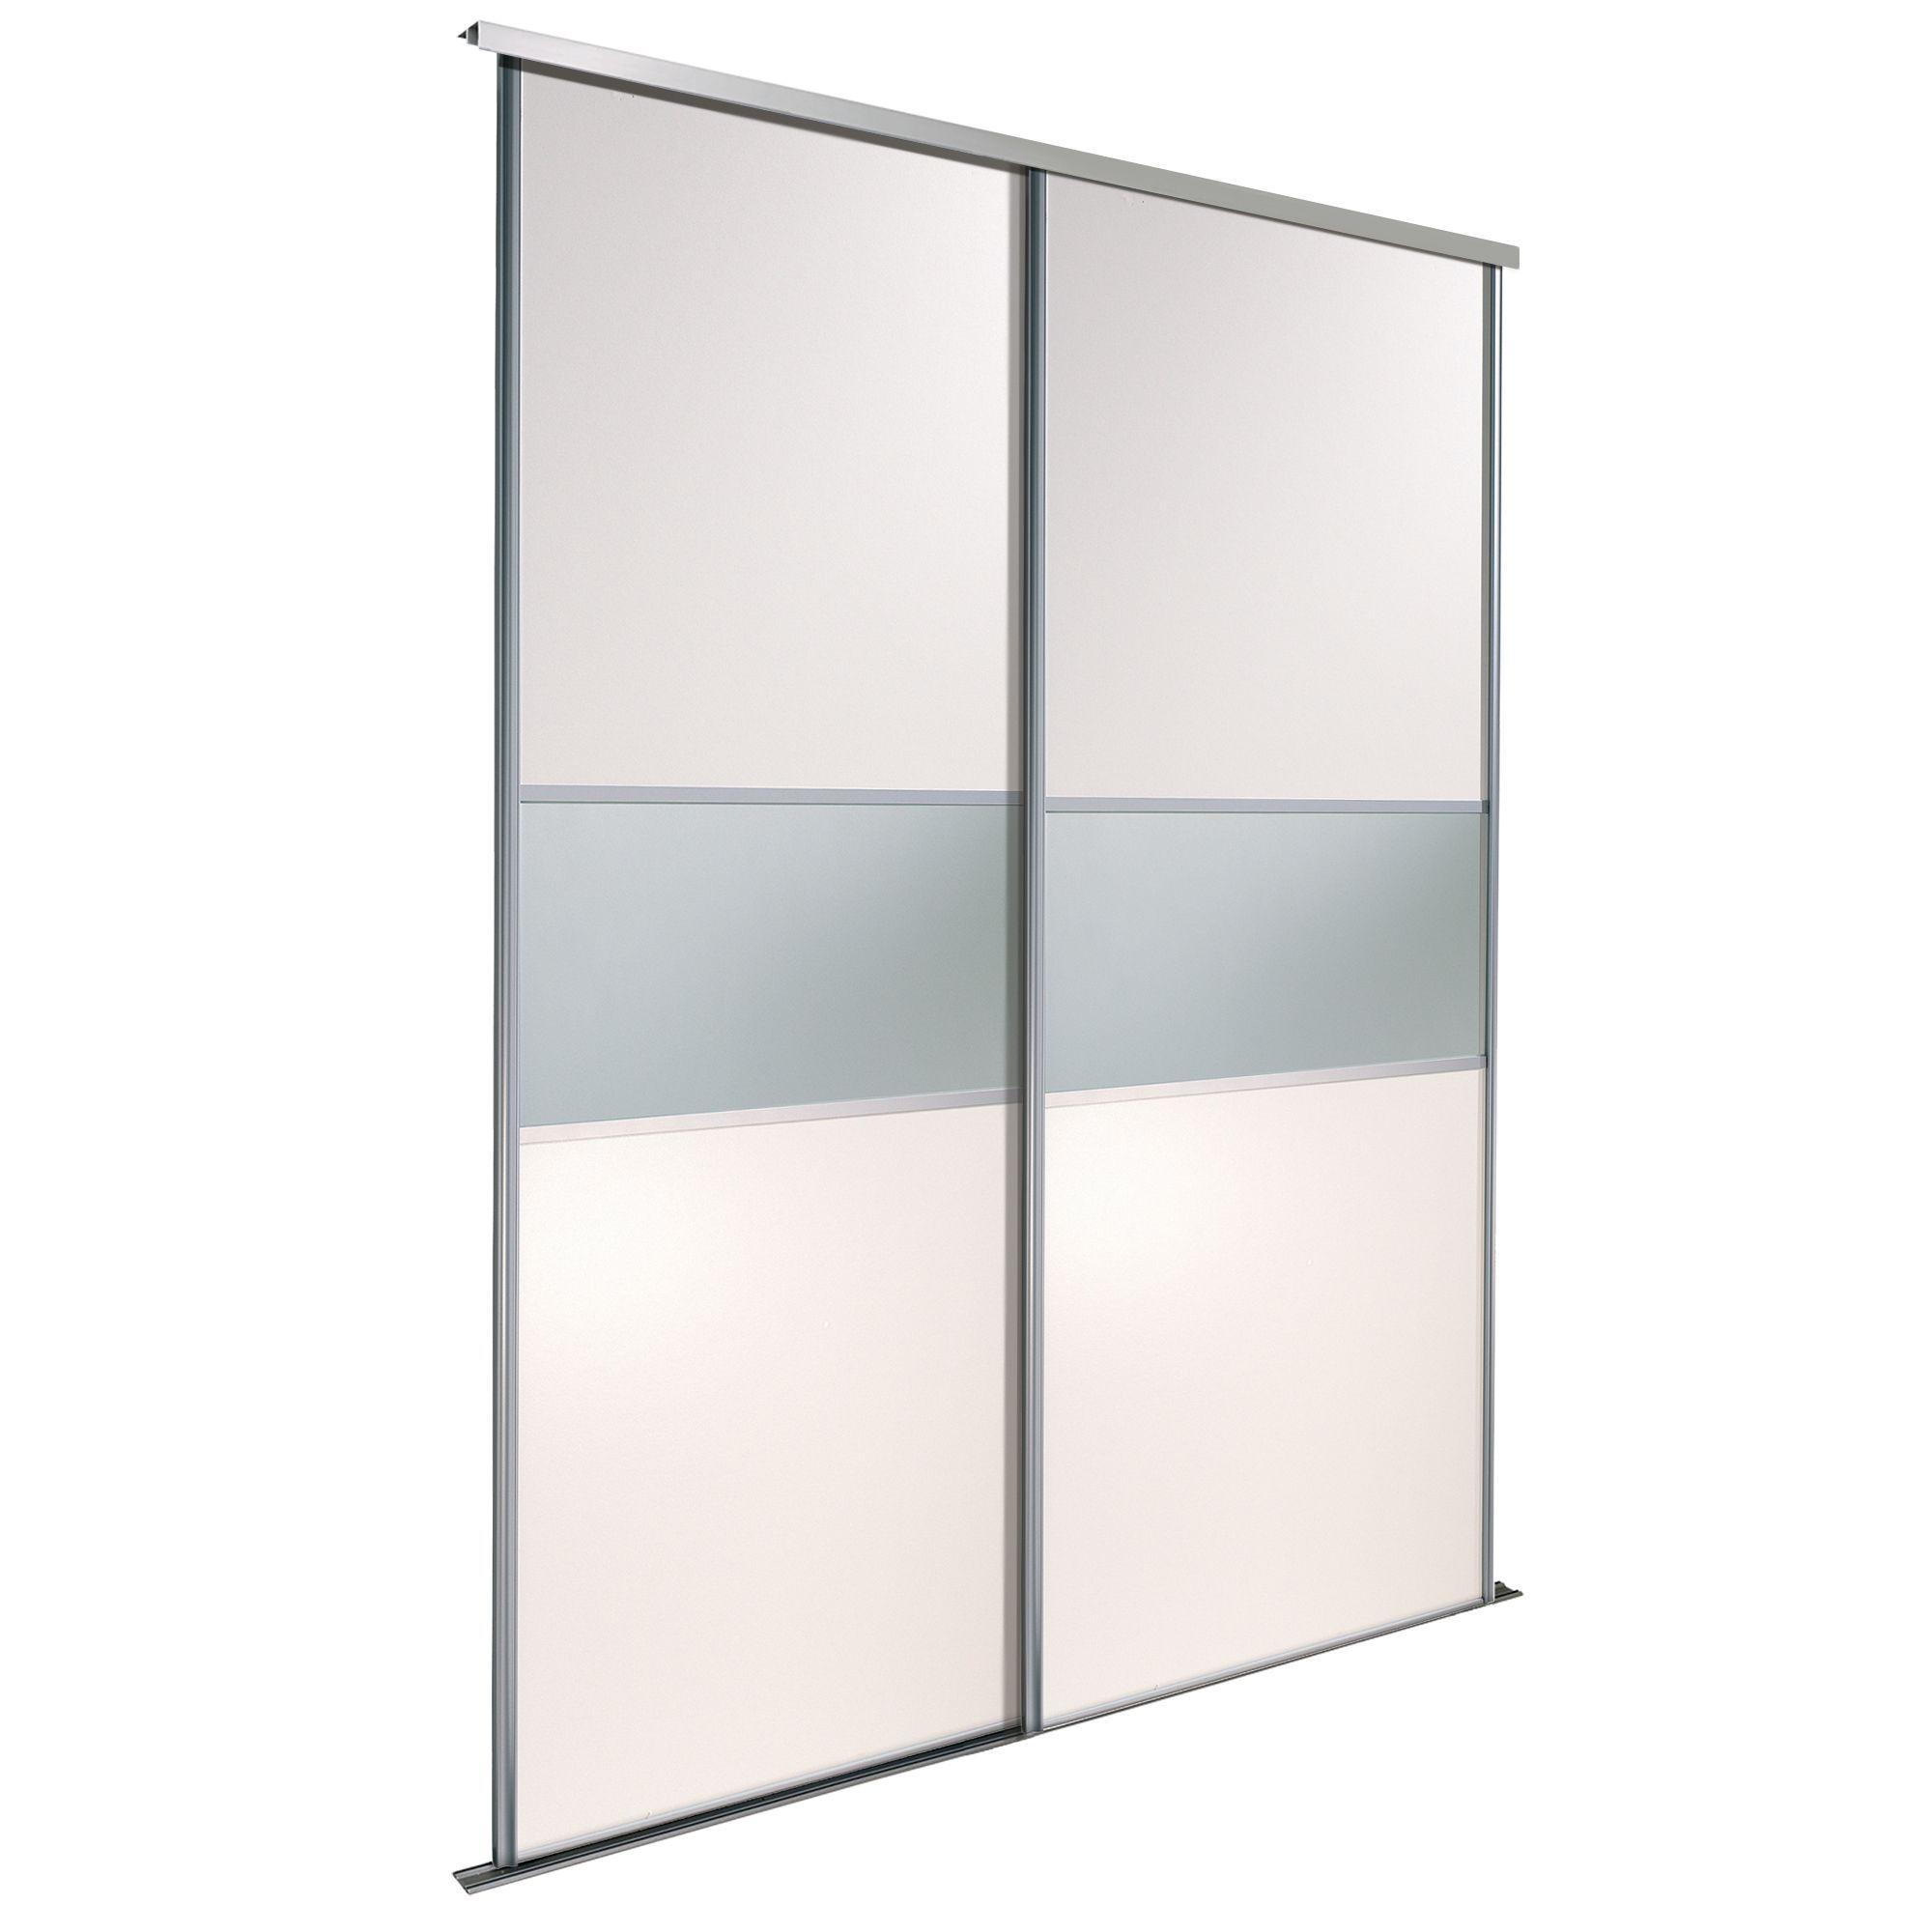 Fineline White Mirror Sliding Wardrobe Door Kit (h)2220 Mm (w)610 Mm, Pack Of 2